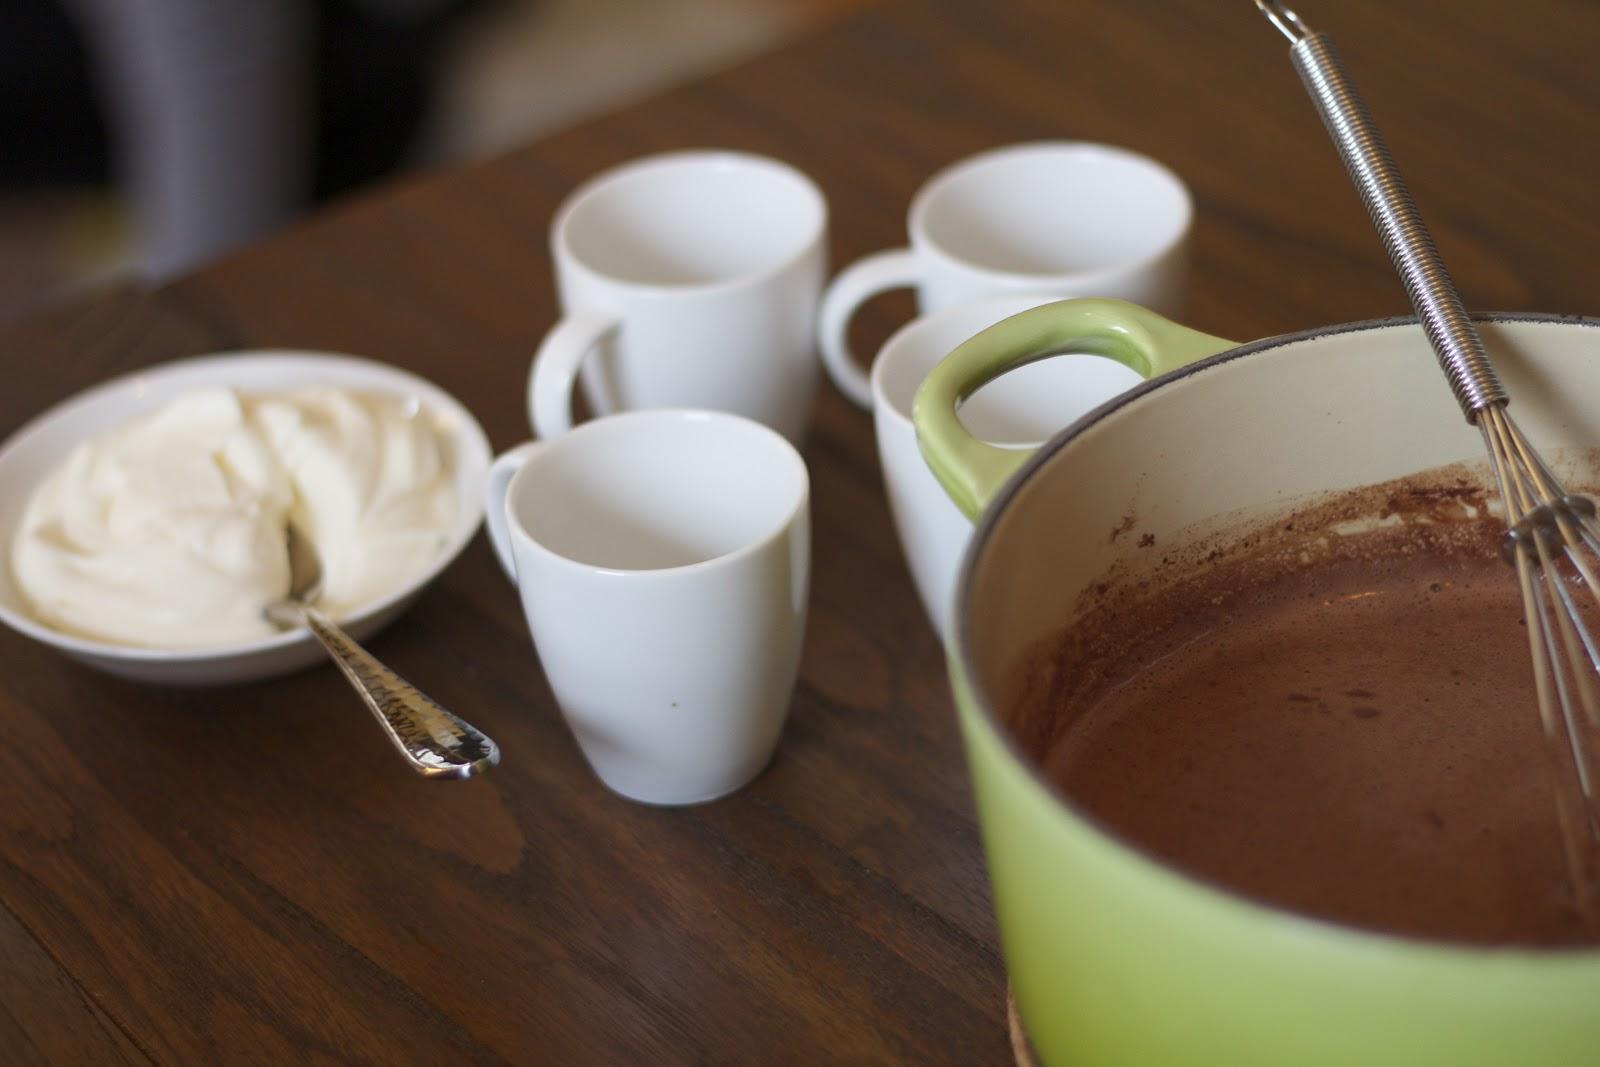 Dish and Tell: Le Chocolat Chaud